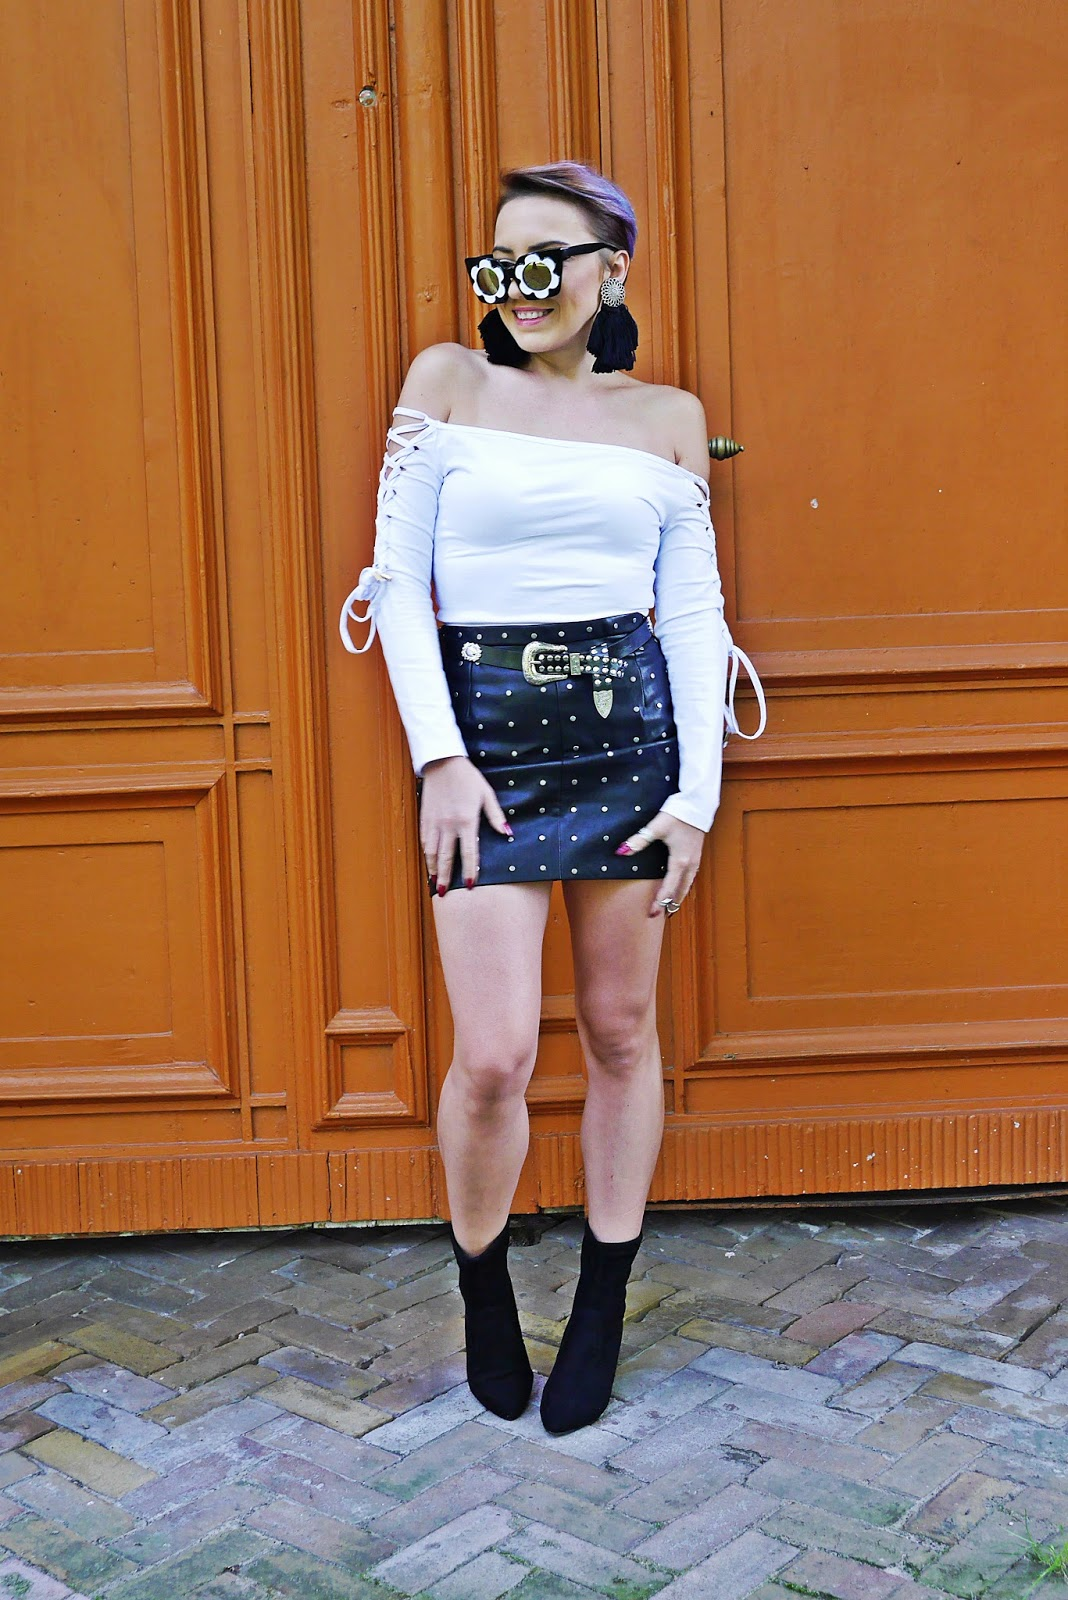 4_flower_sunglass_leather_skirt_socks_shoes_belt_white_top_karyn_blog_modowy_110917